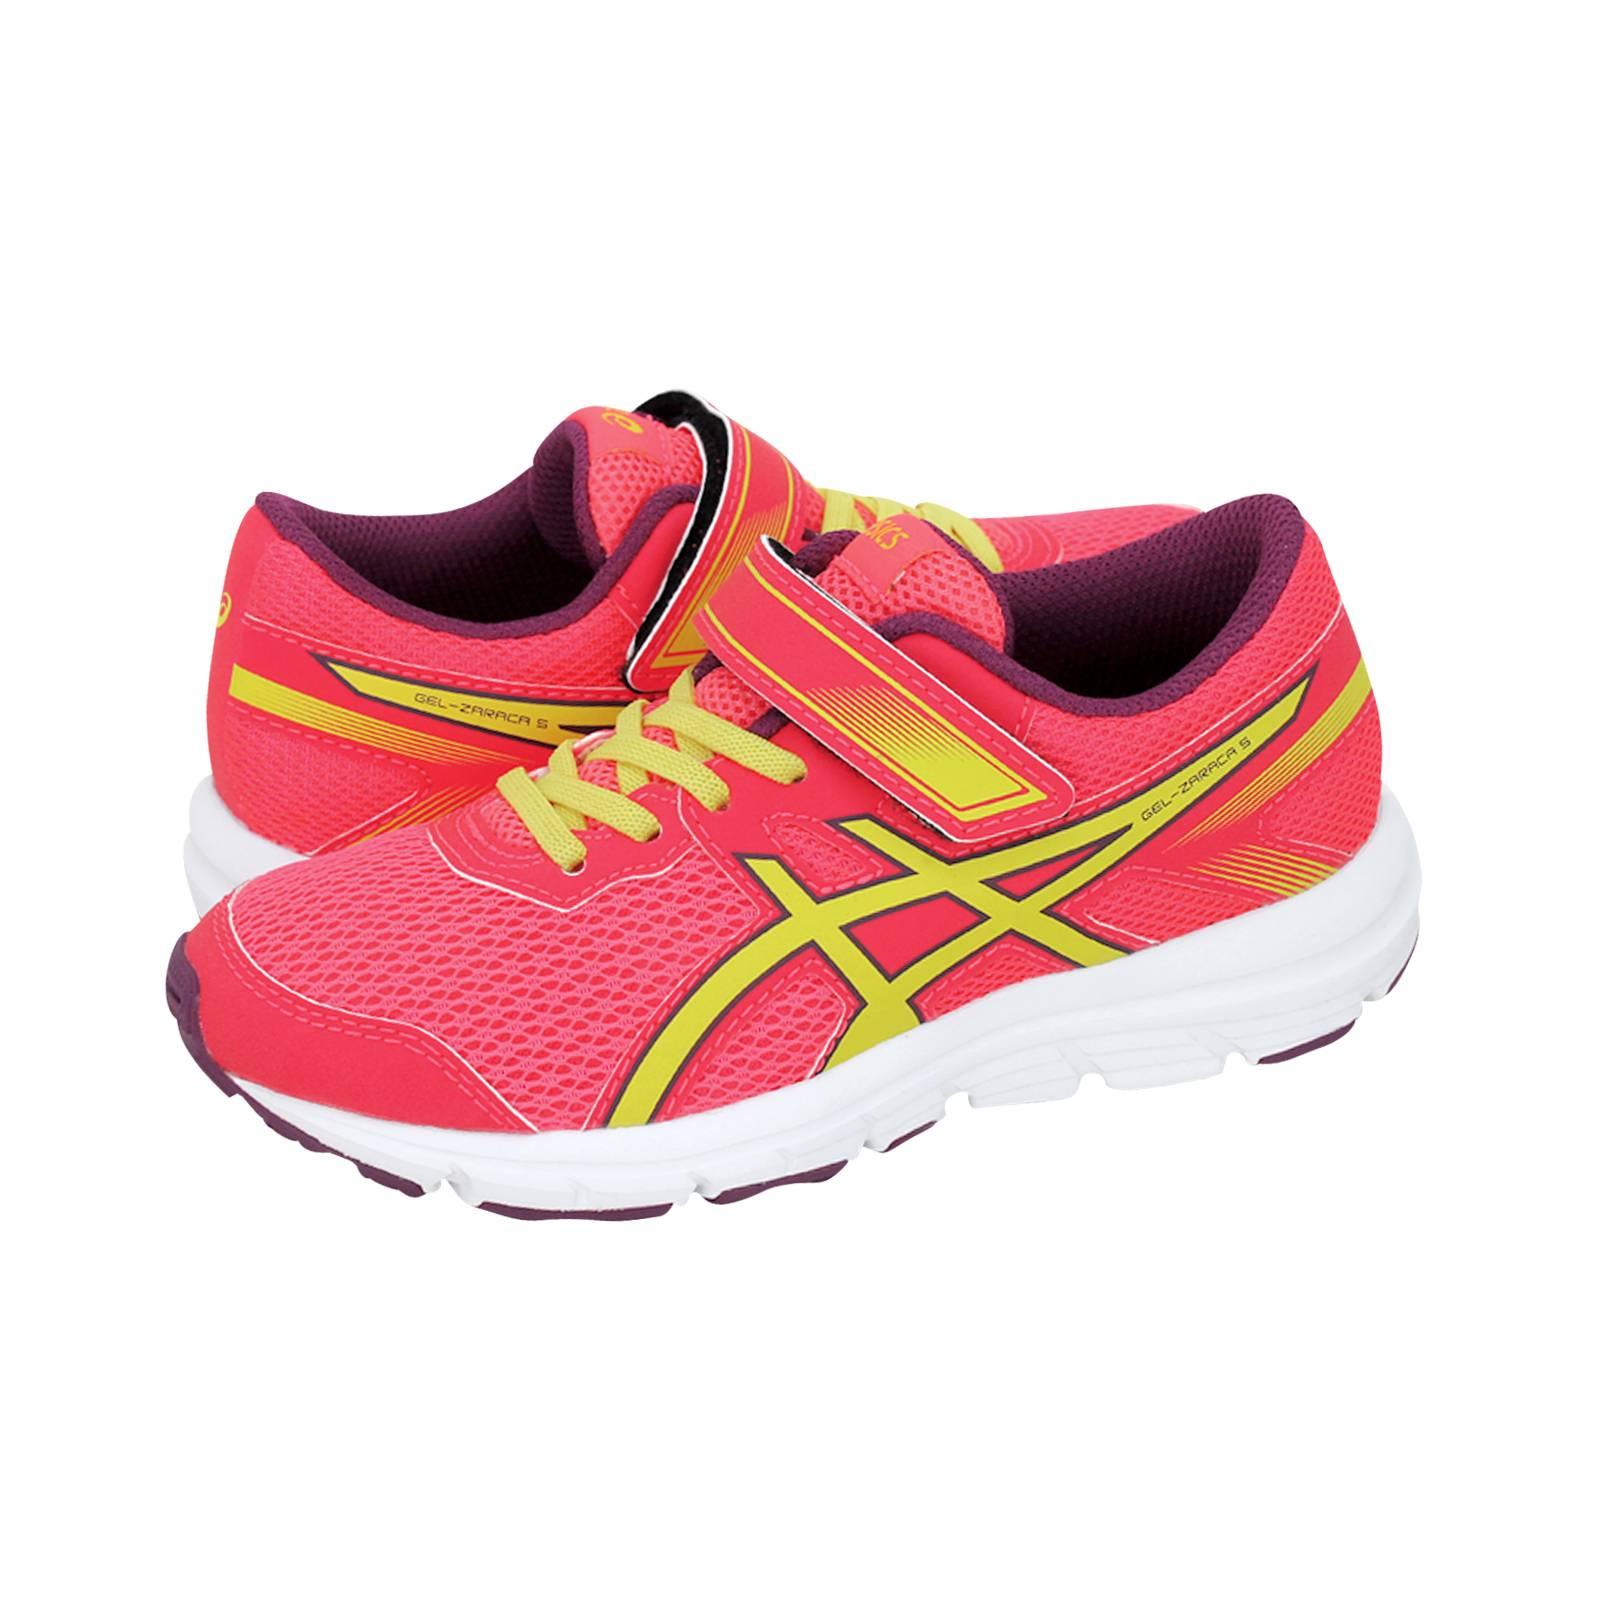 Gel-Zaraca 5 PS - Παιδικά αθλητικά παπούτσια Asics από υφασμα και ... b5c989aa44d